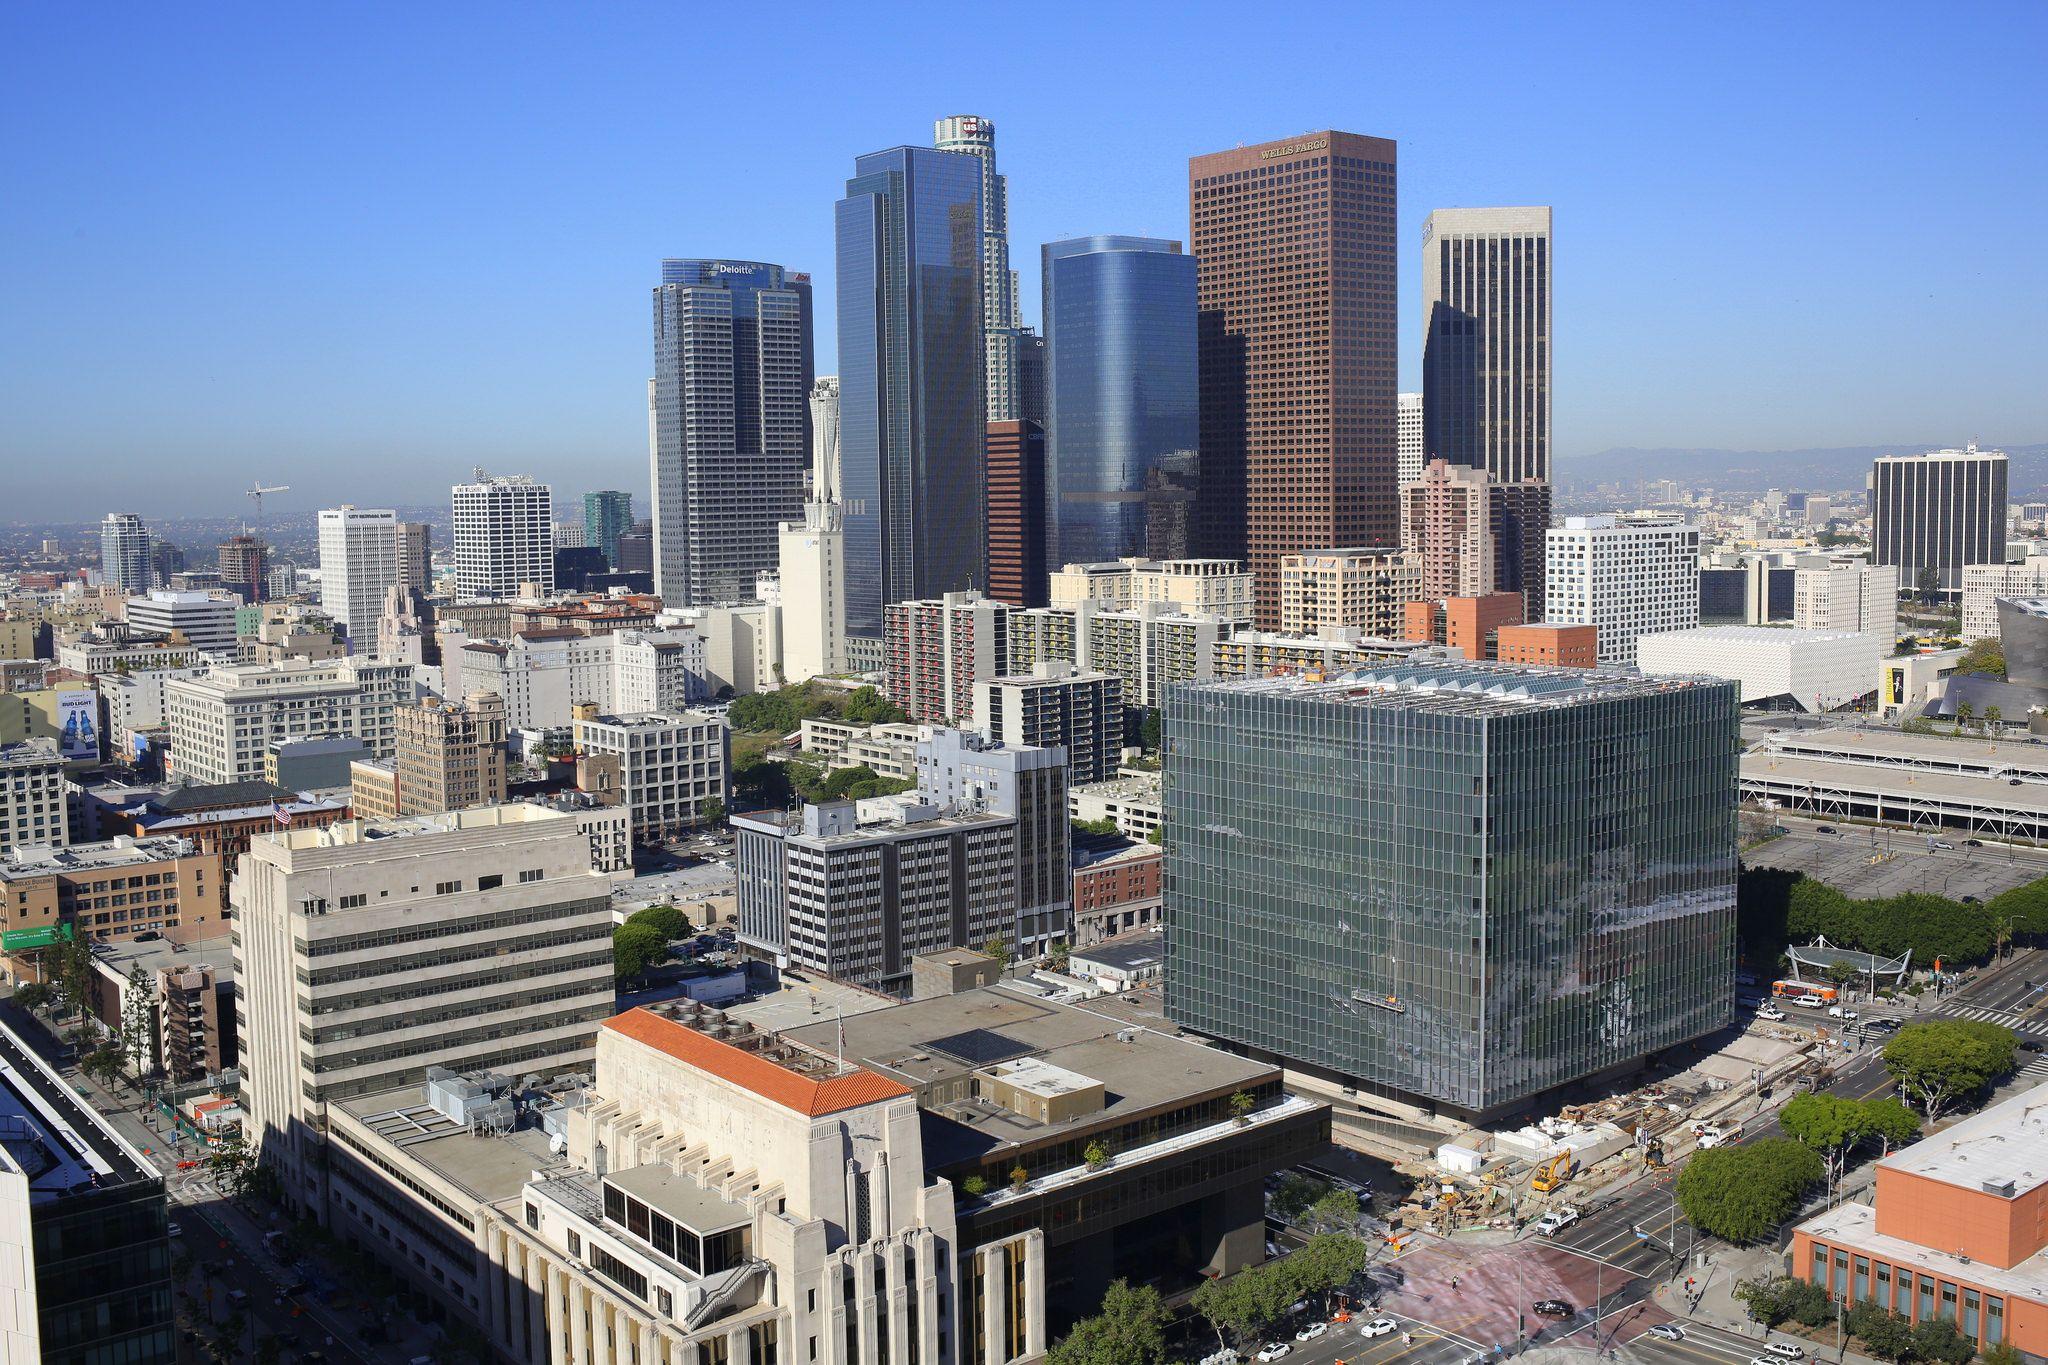 Los Angeles Downtown Skylines Dallas Skyline Los Angeles City Los Angeles Skyline